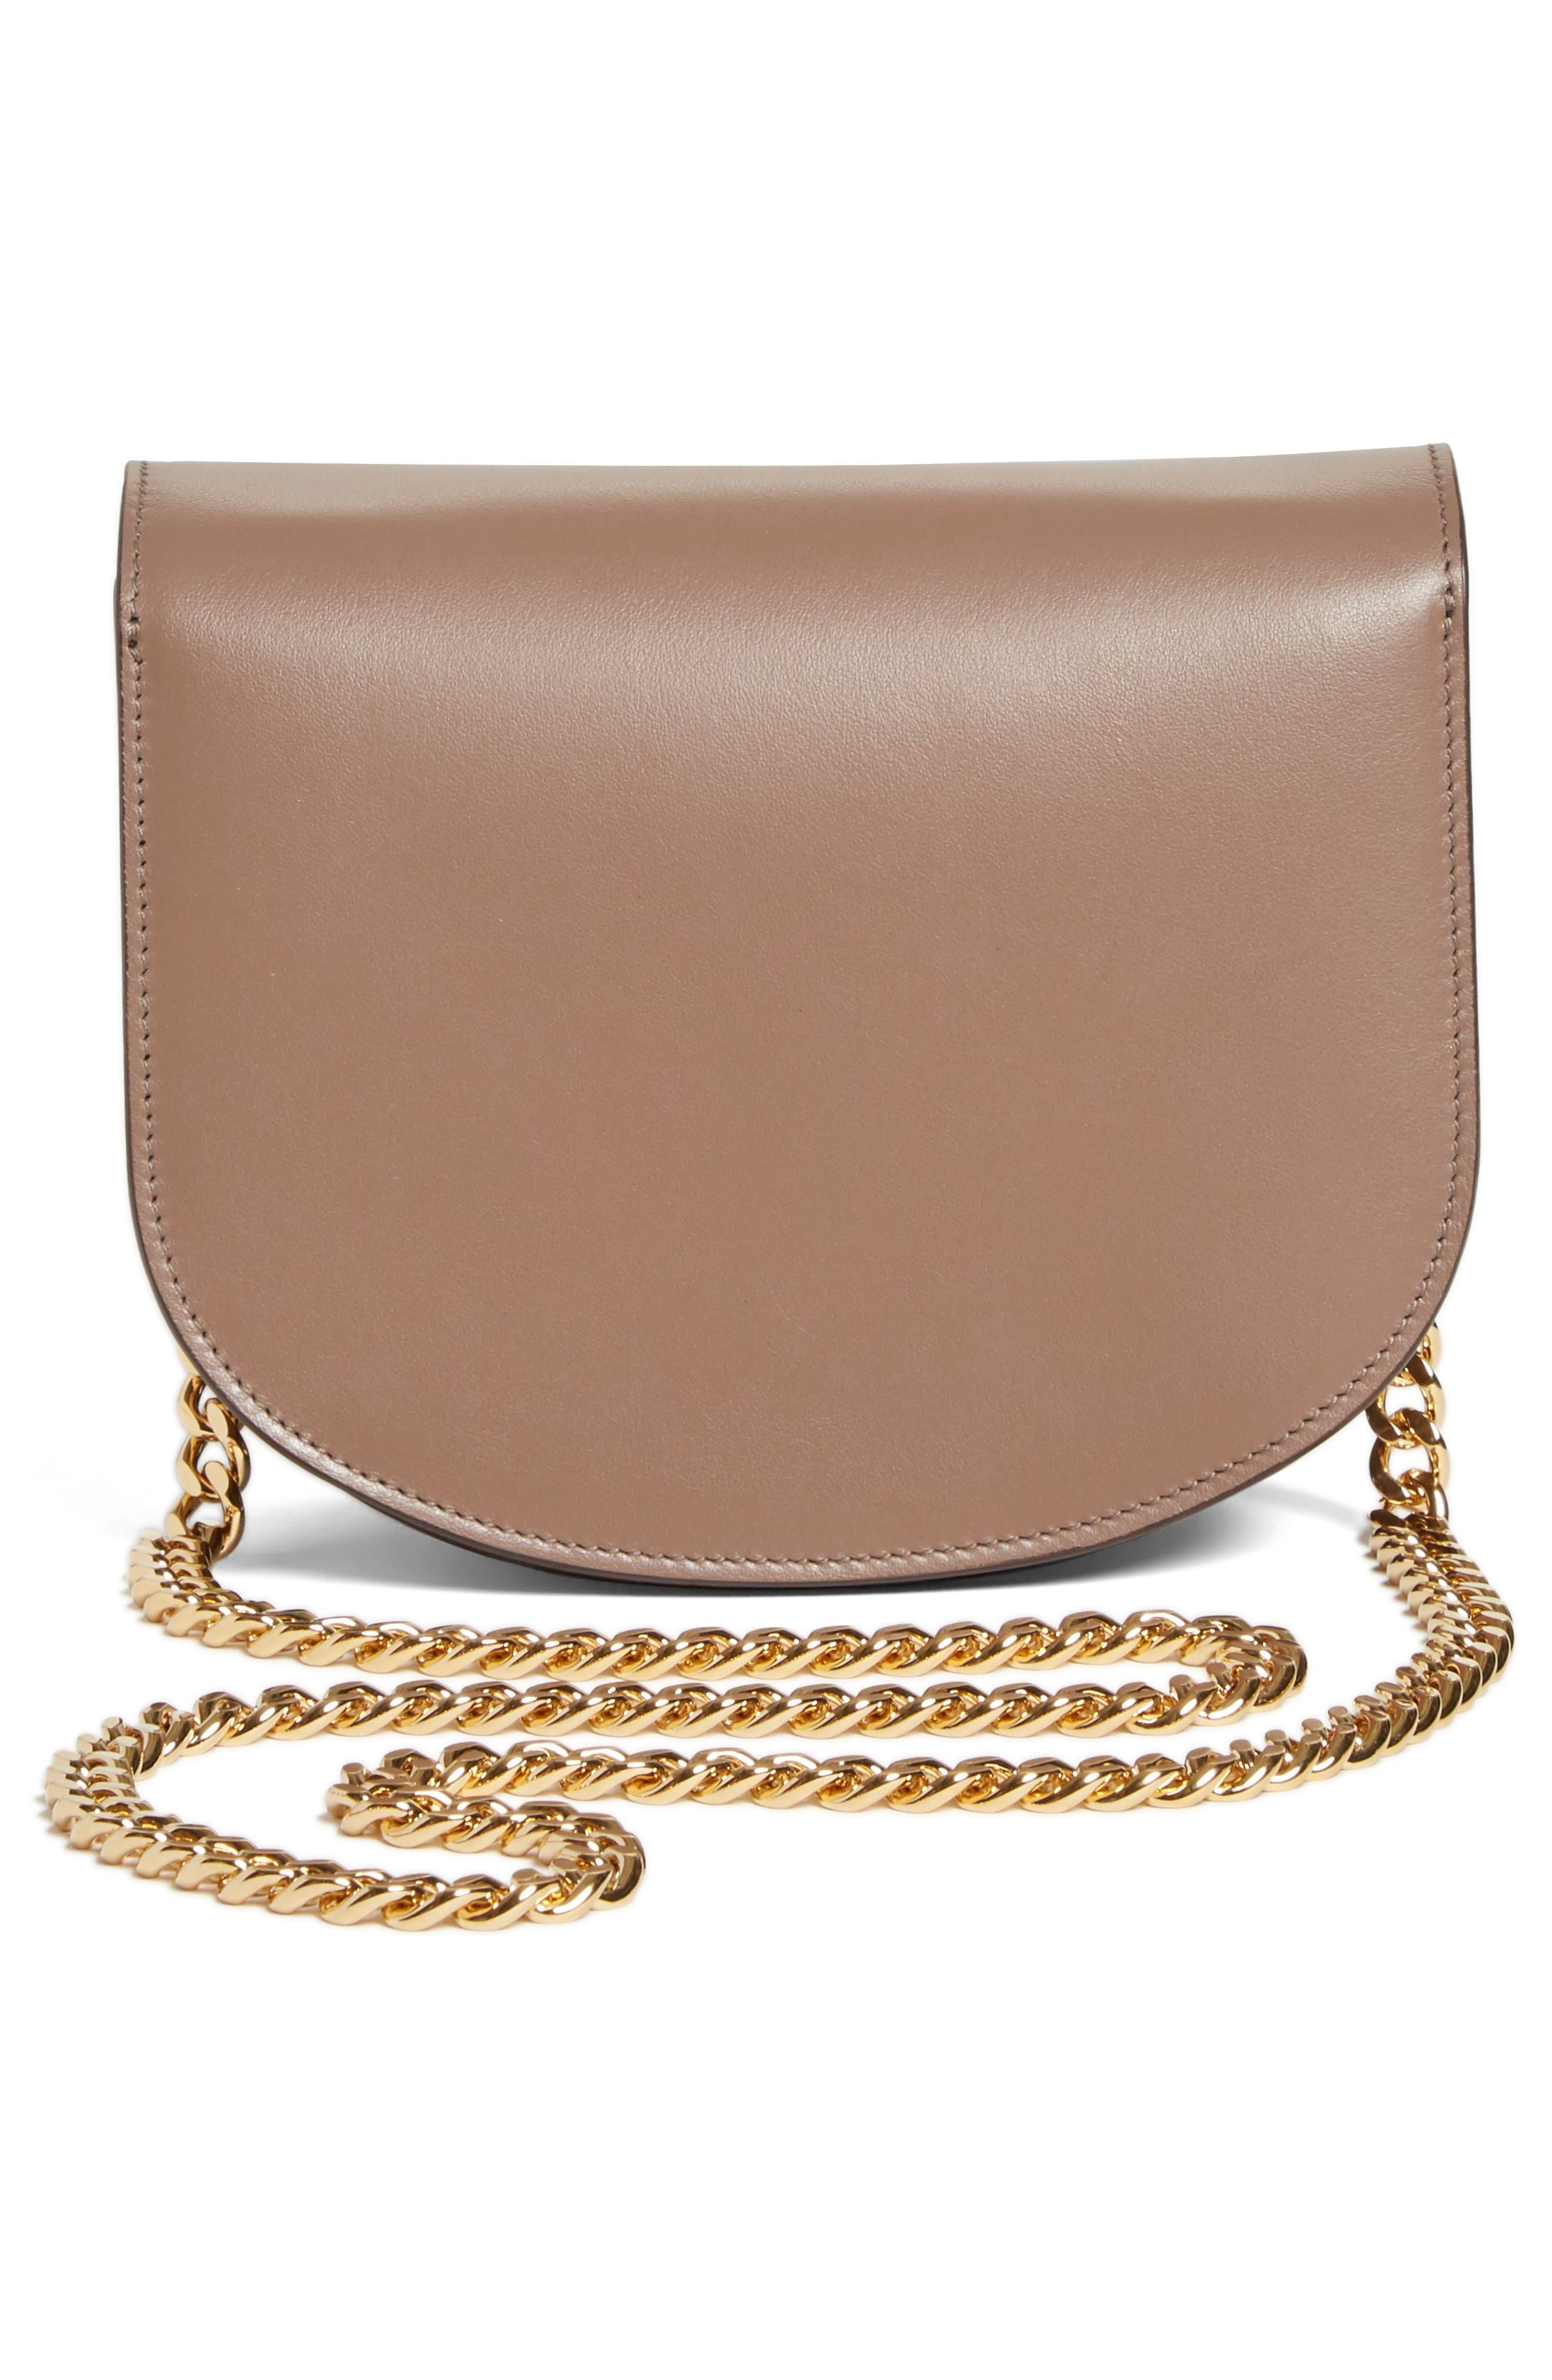 Medium Box Leather Shoulder Bag,                             Alternate thumbnail 3, color,                             200